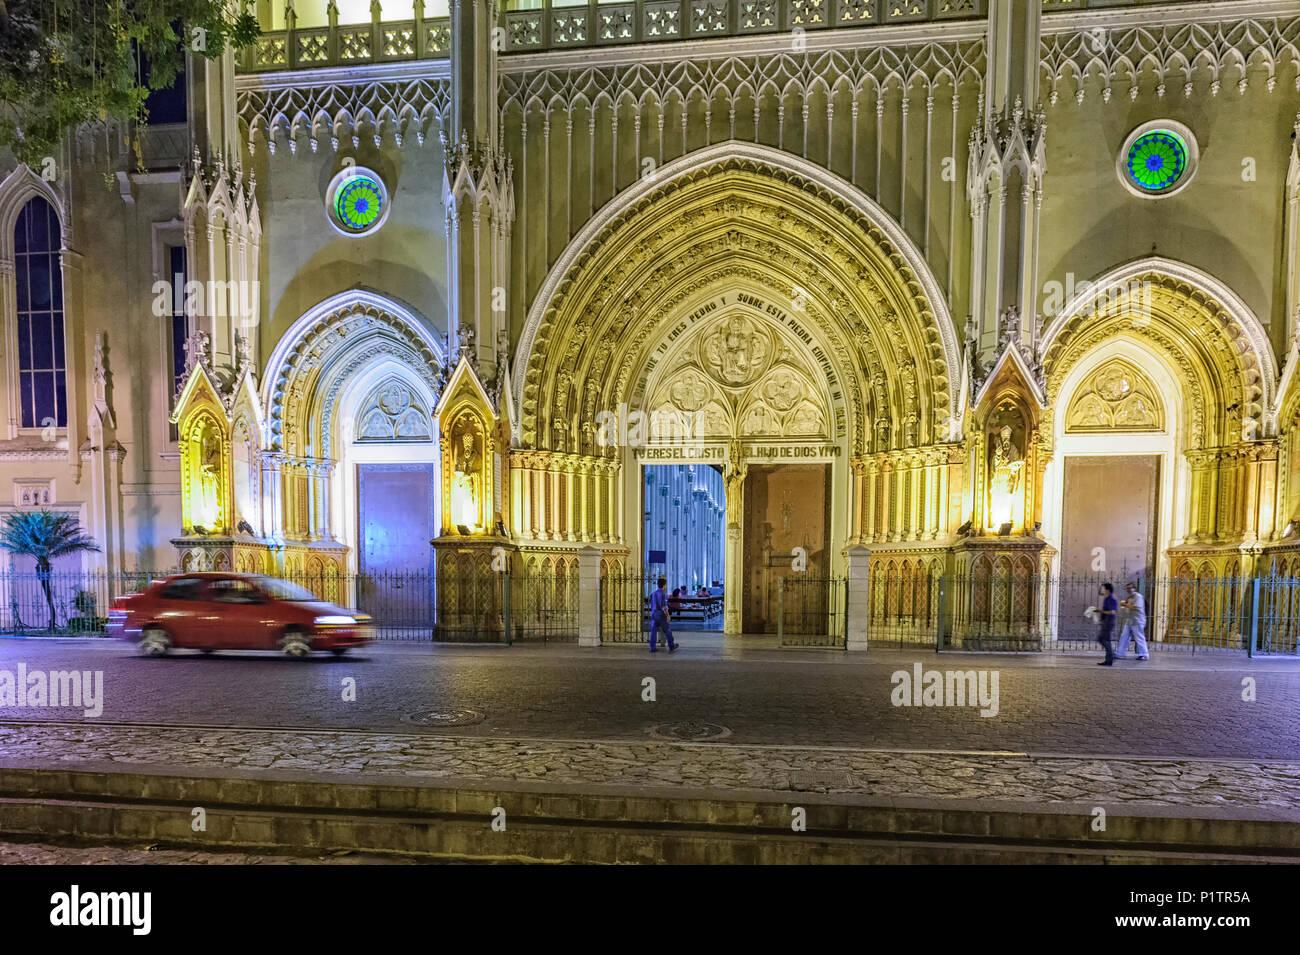 Metropolitan Cathedral of Guayaquil, Ecuador - Stock Image